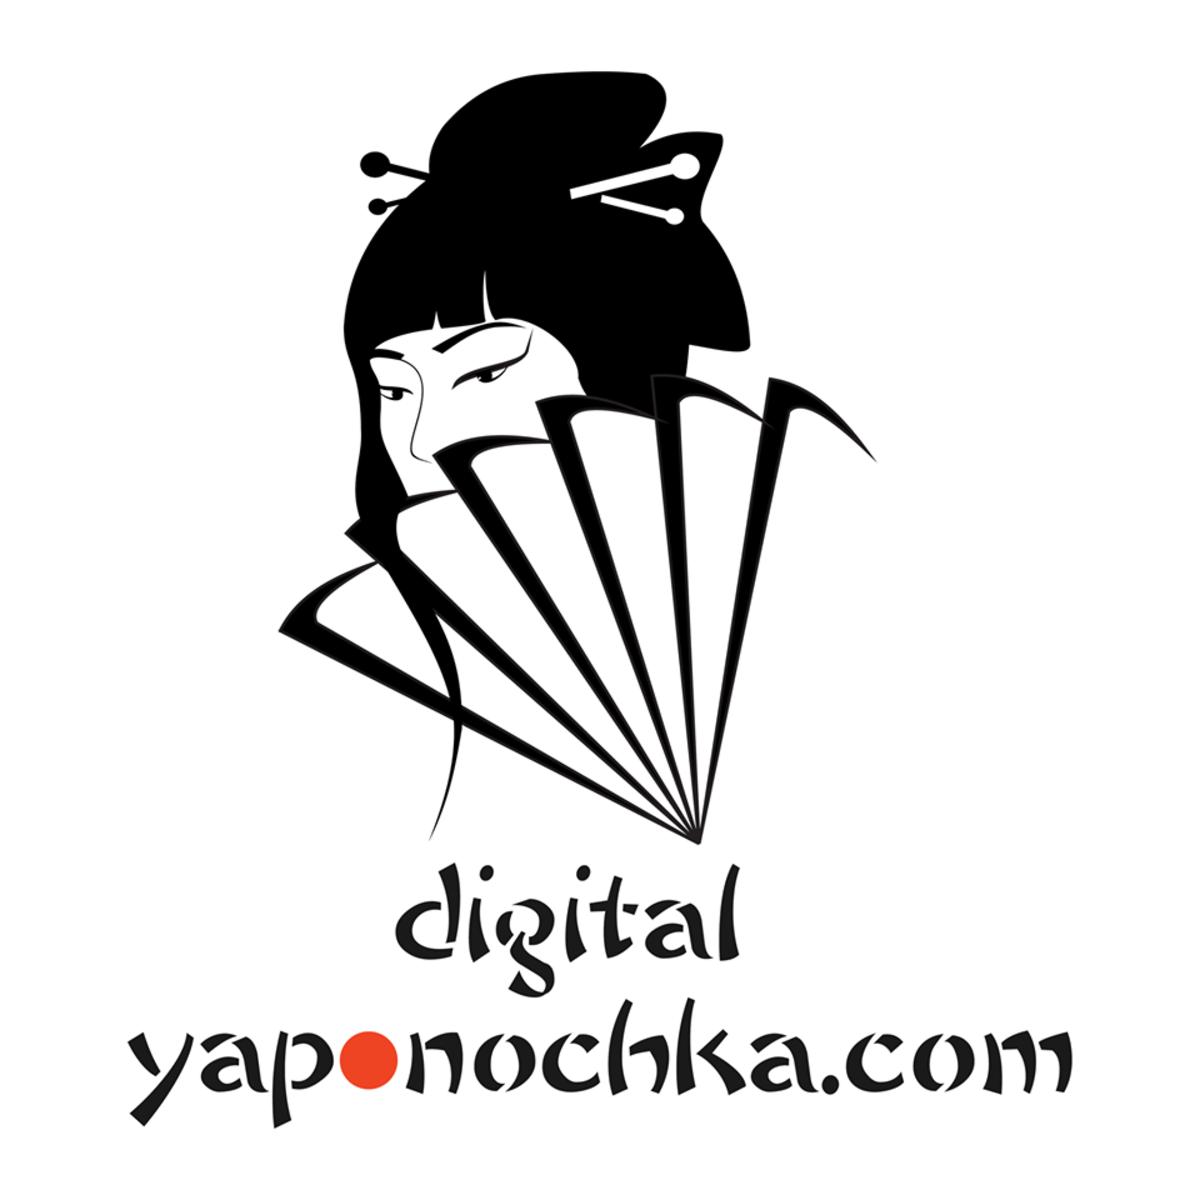 Проекты Digital Yaponochka / Проект компании Digital Yaponochka